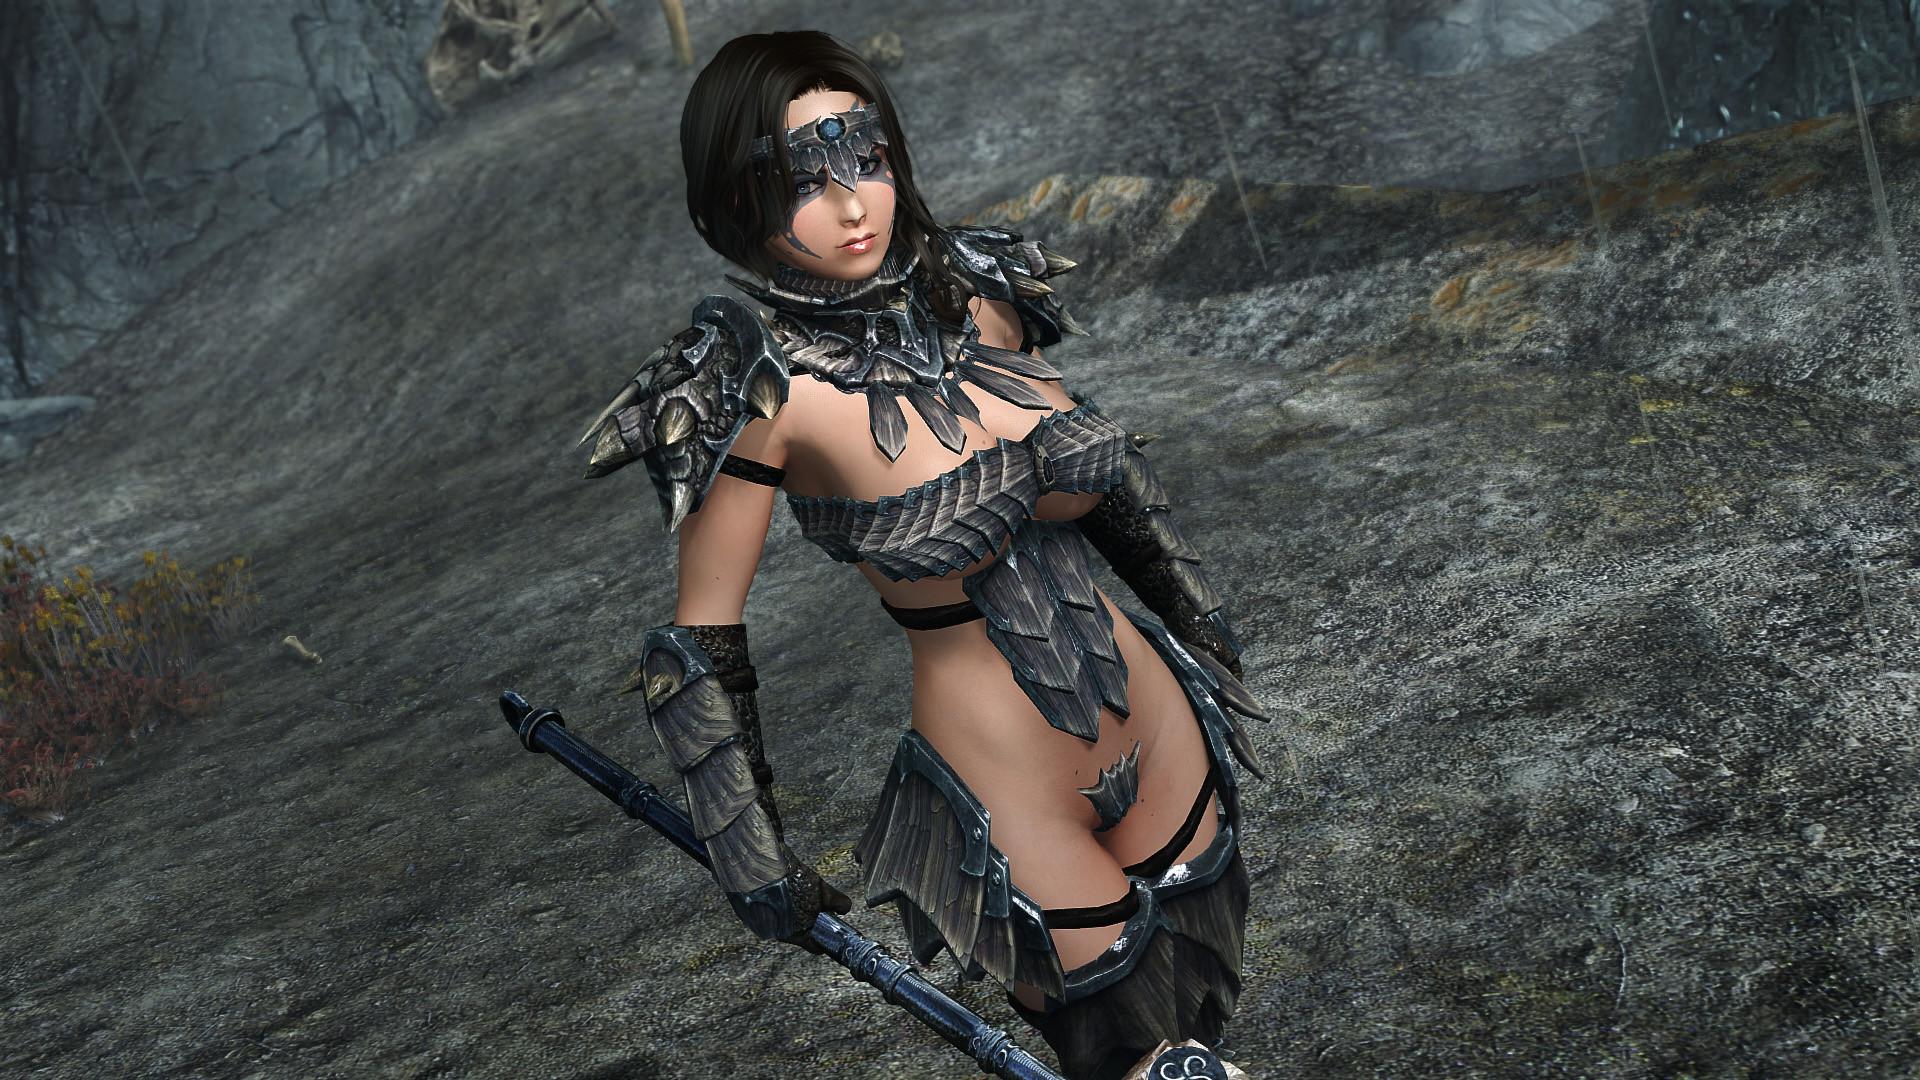 Dragonscale Bikini